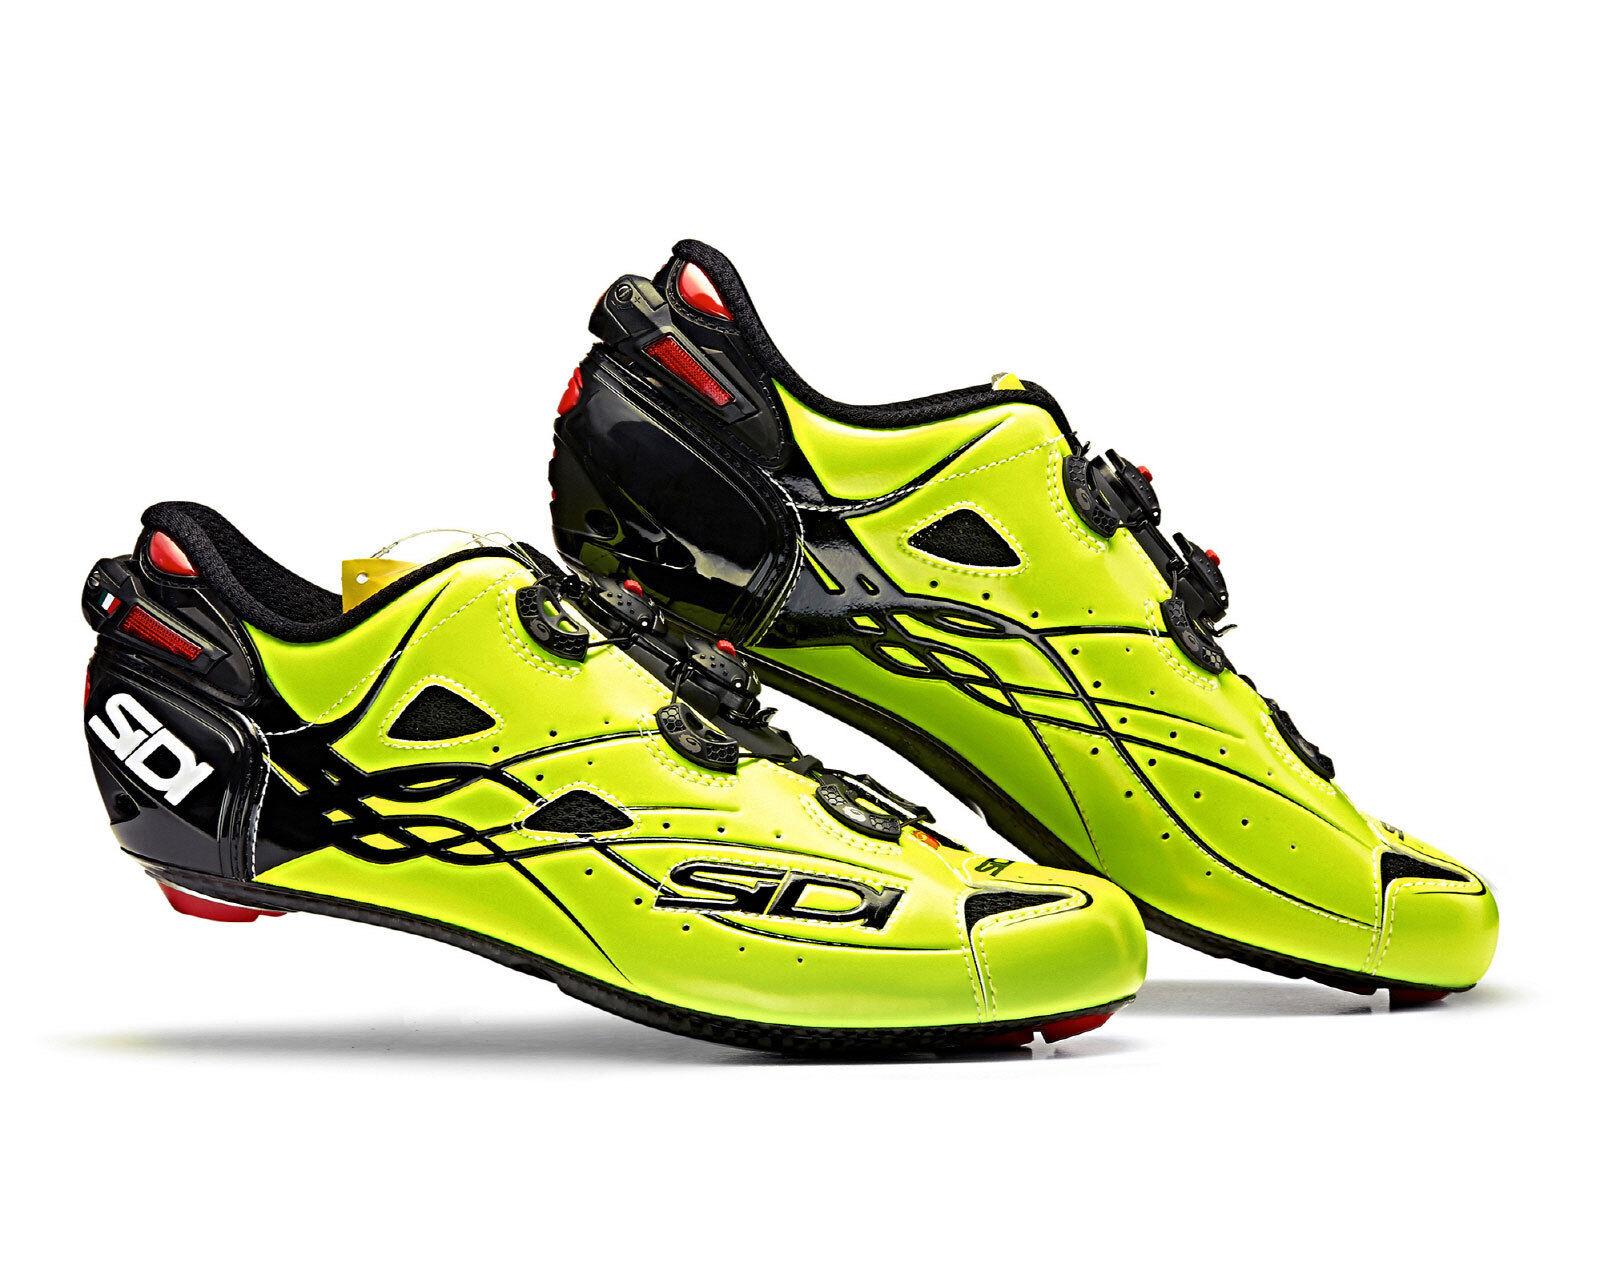 SIDI SHOT Carbon Road Cycling shoes - Bright Yellow